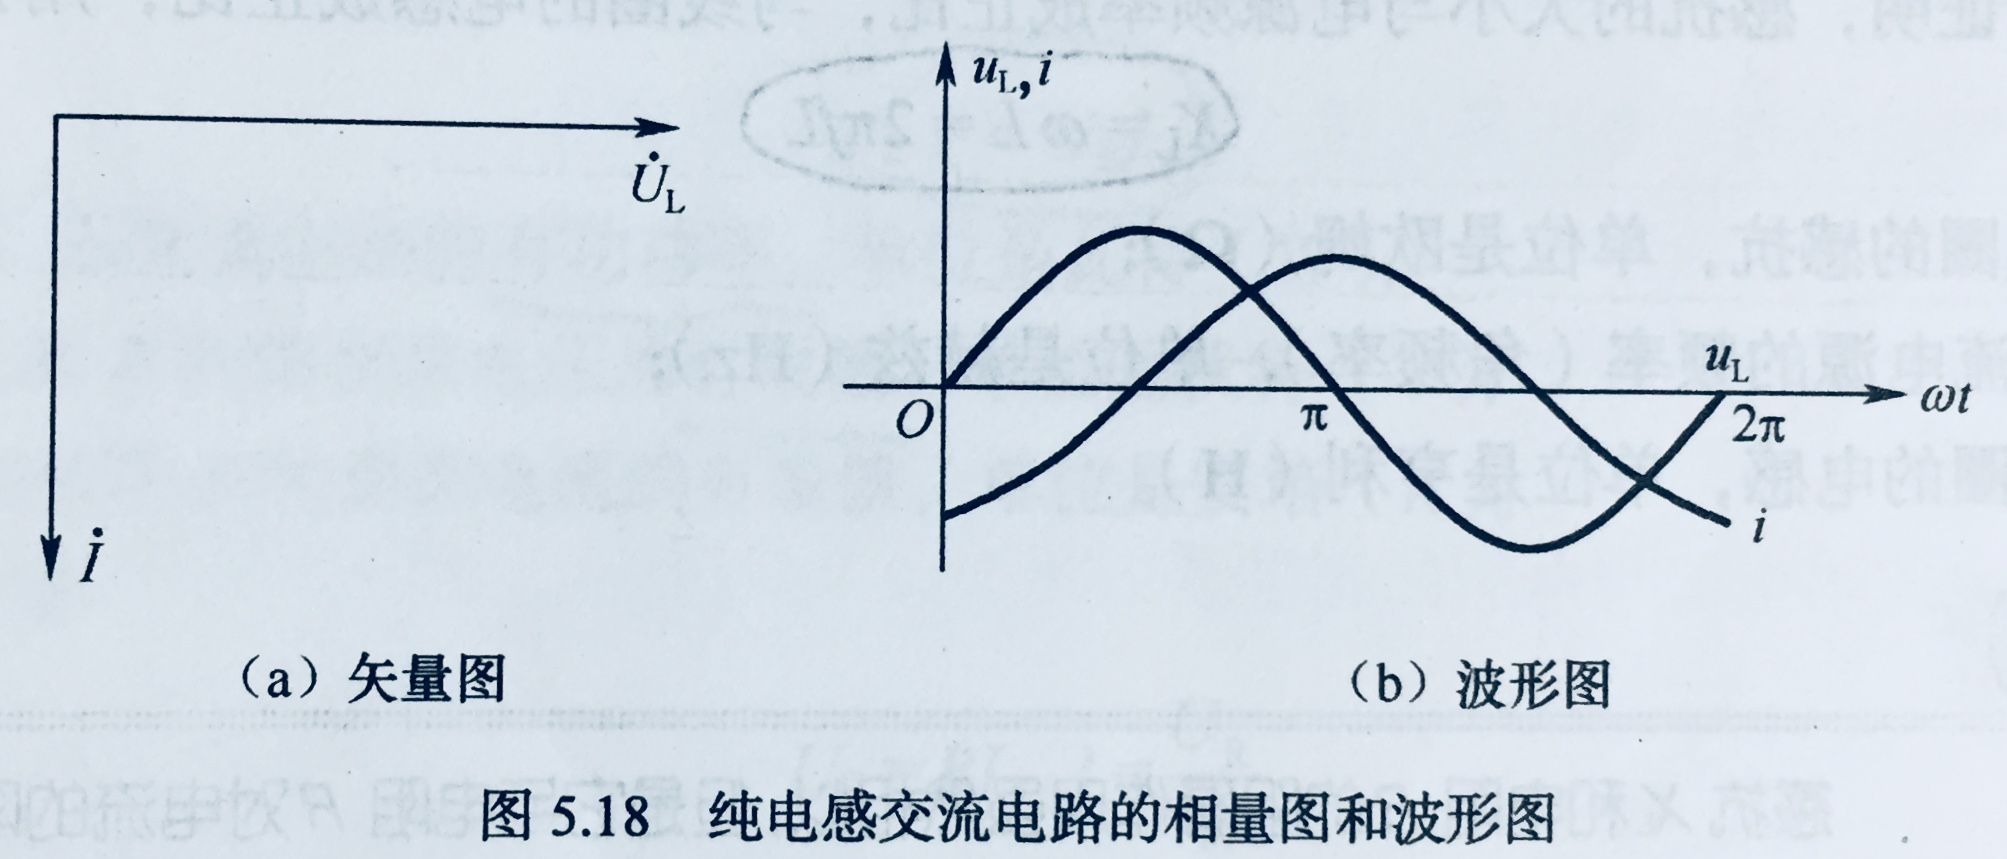 it科技 纯电感交流电路的电流与电压的相量图如图(a)所示,波形图如图